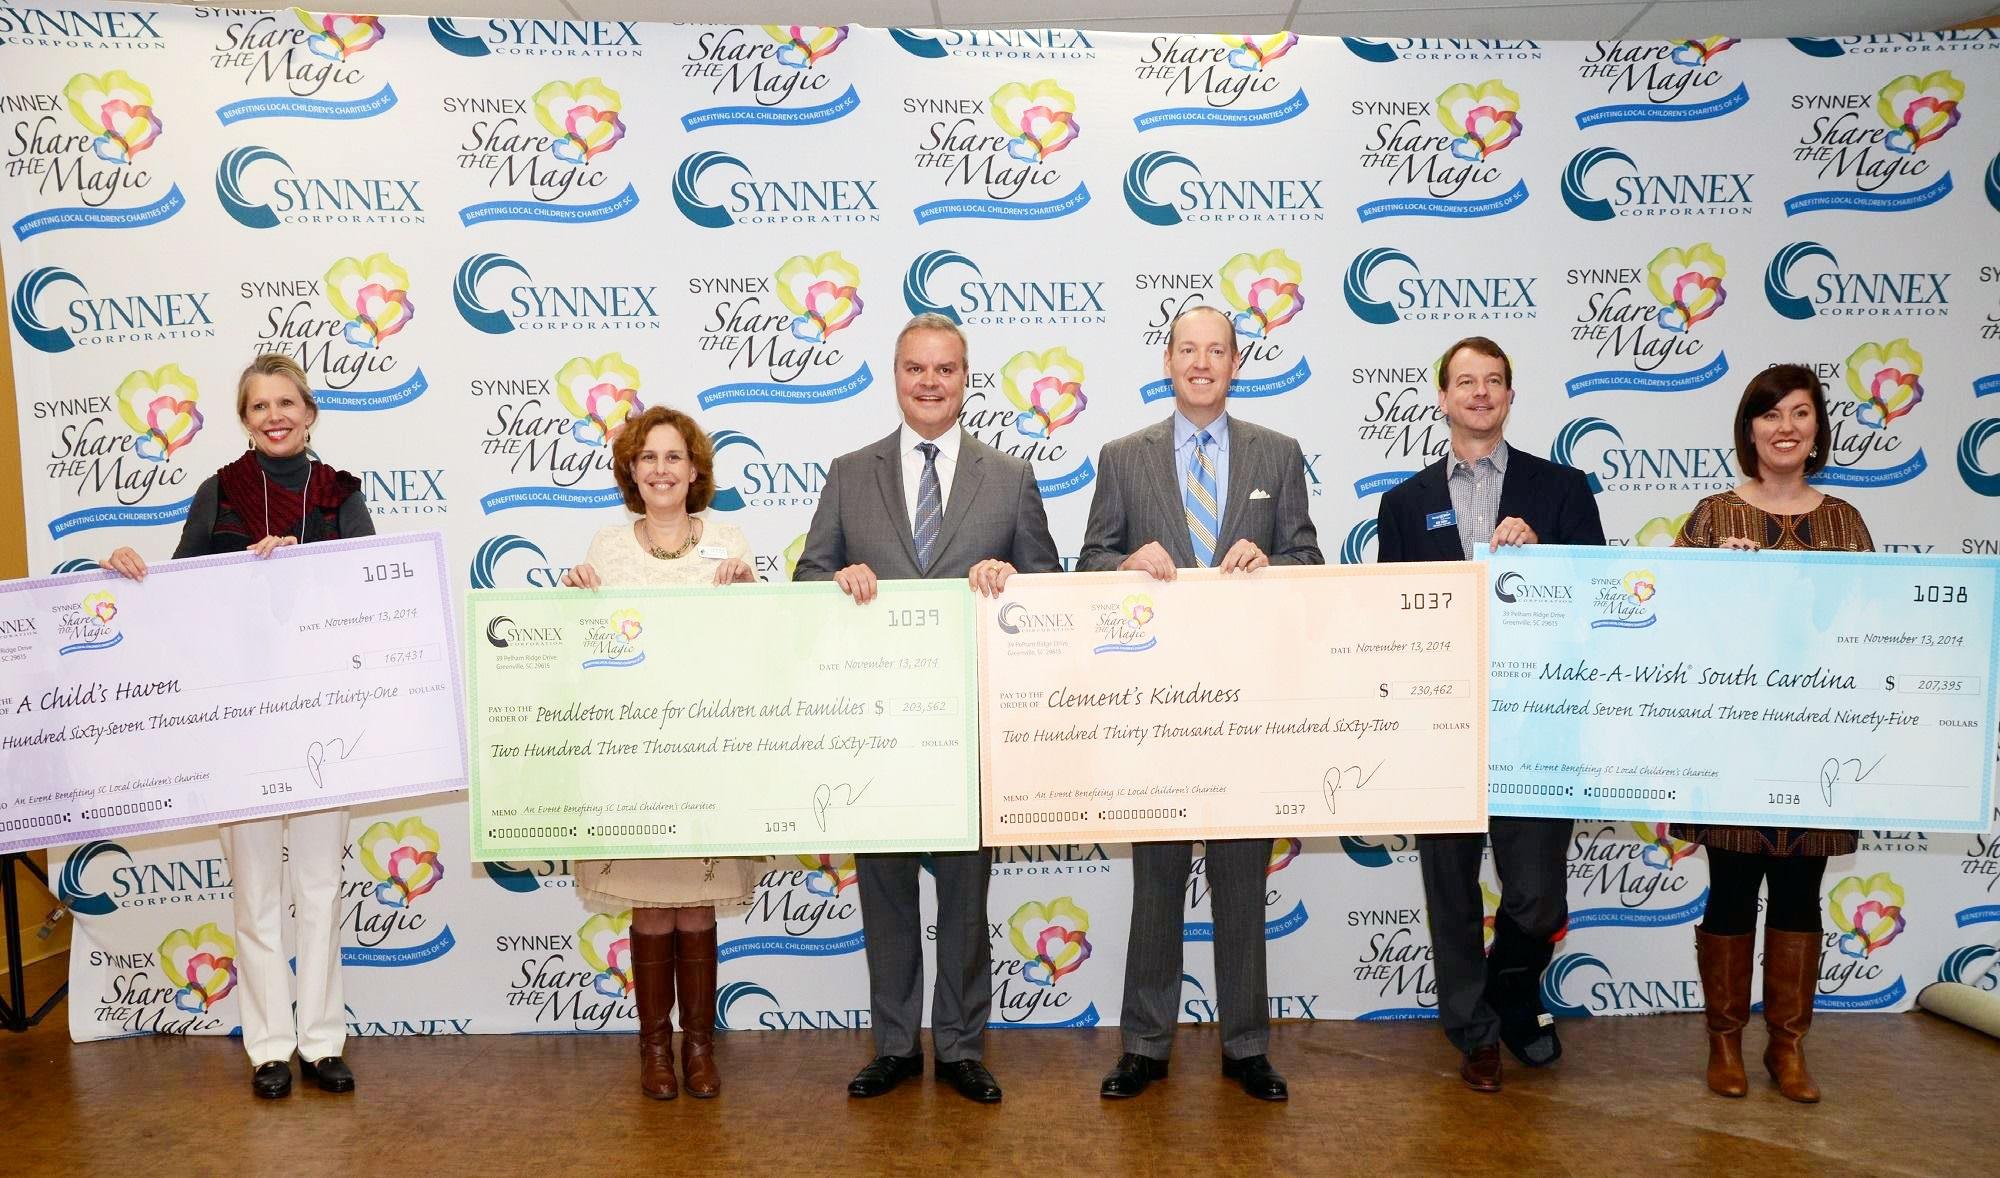 SYNNEX <em>Share the Magic</em> to Present Checks to Upstate Children's Charities